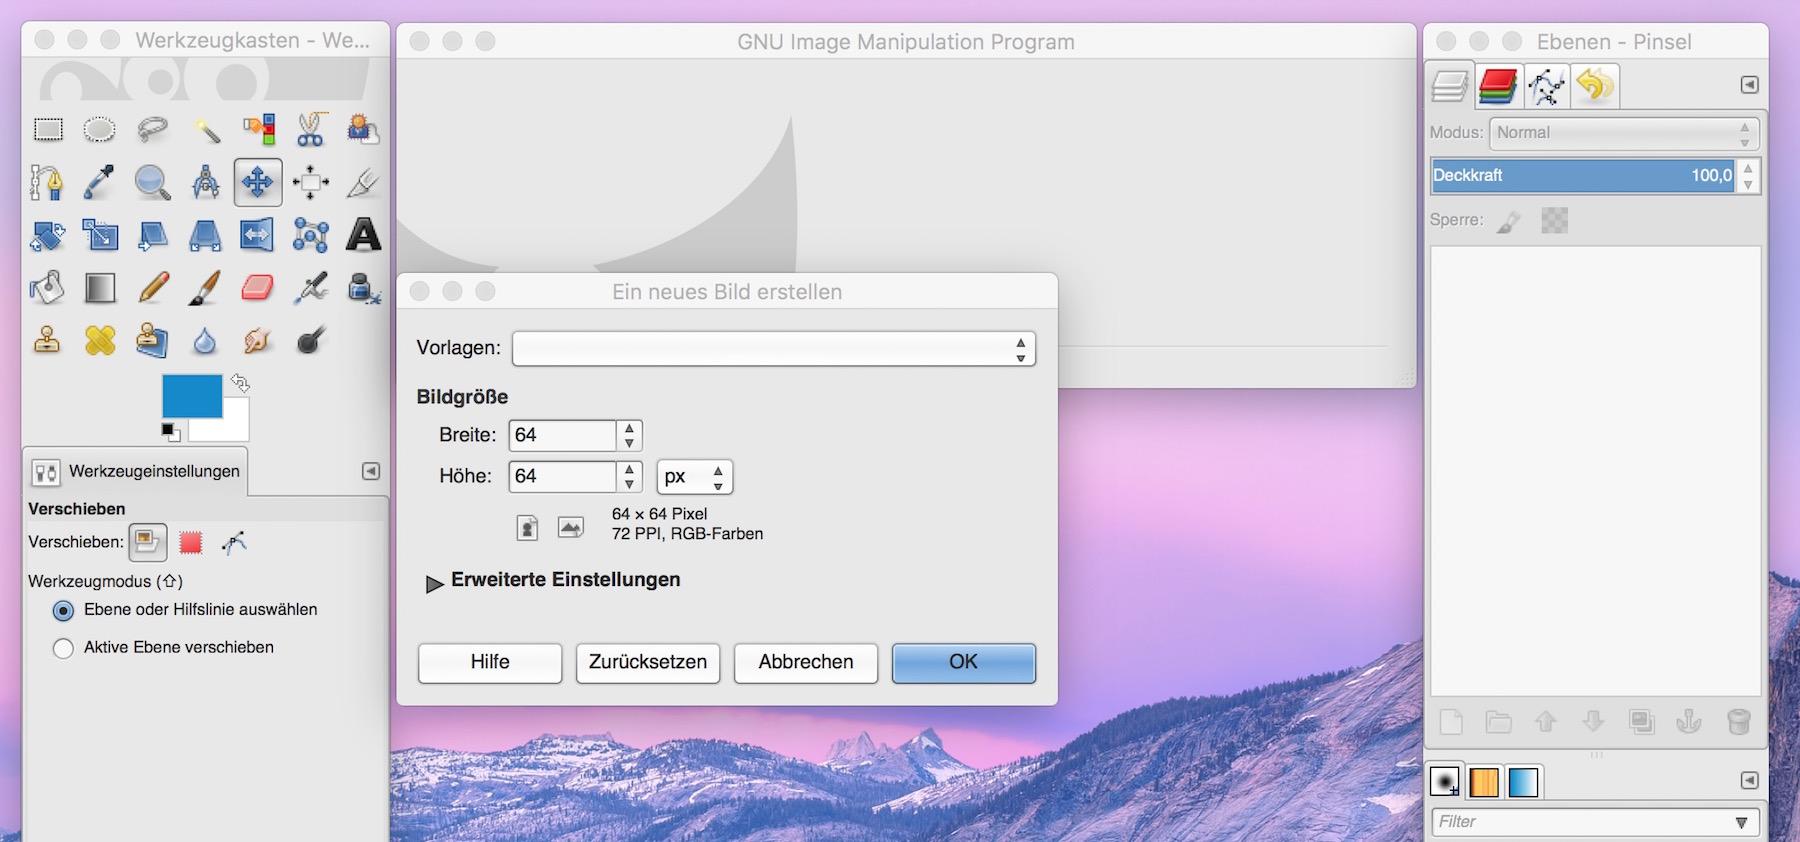 Bild in GIMP erstellen